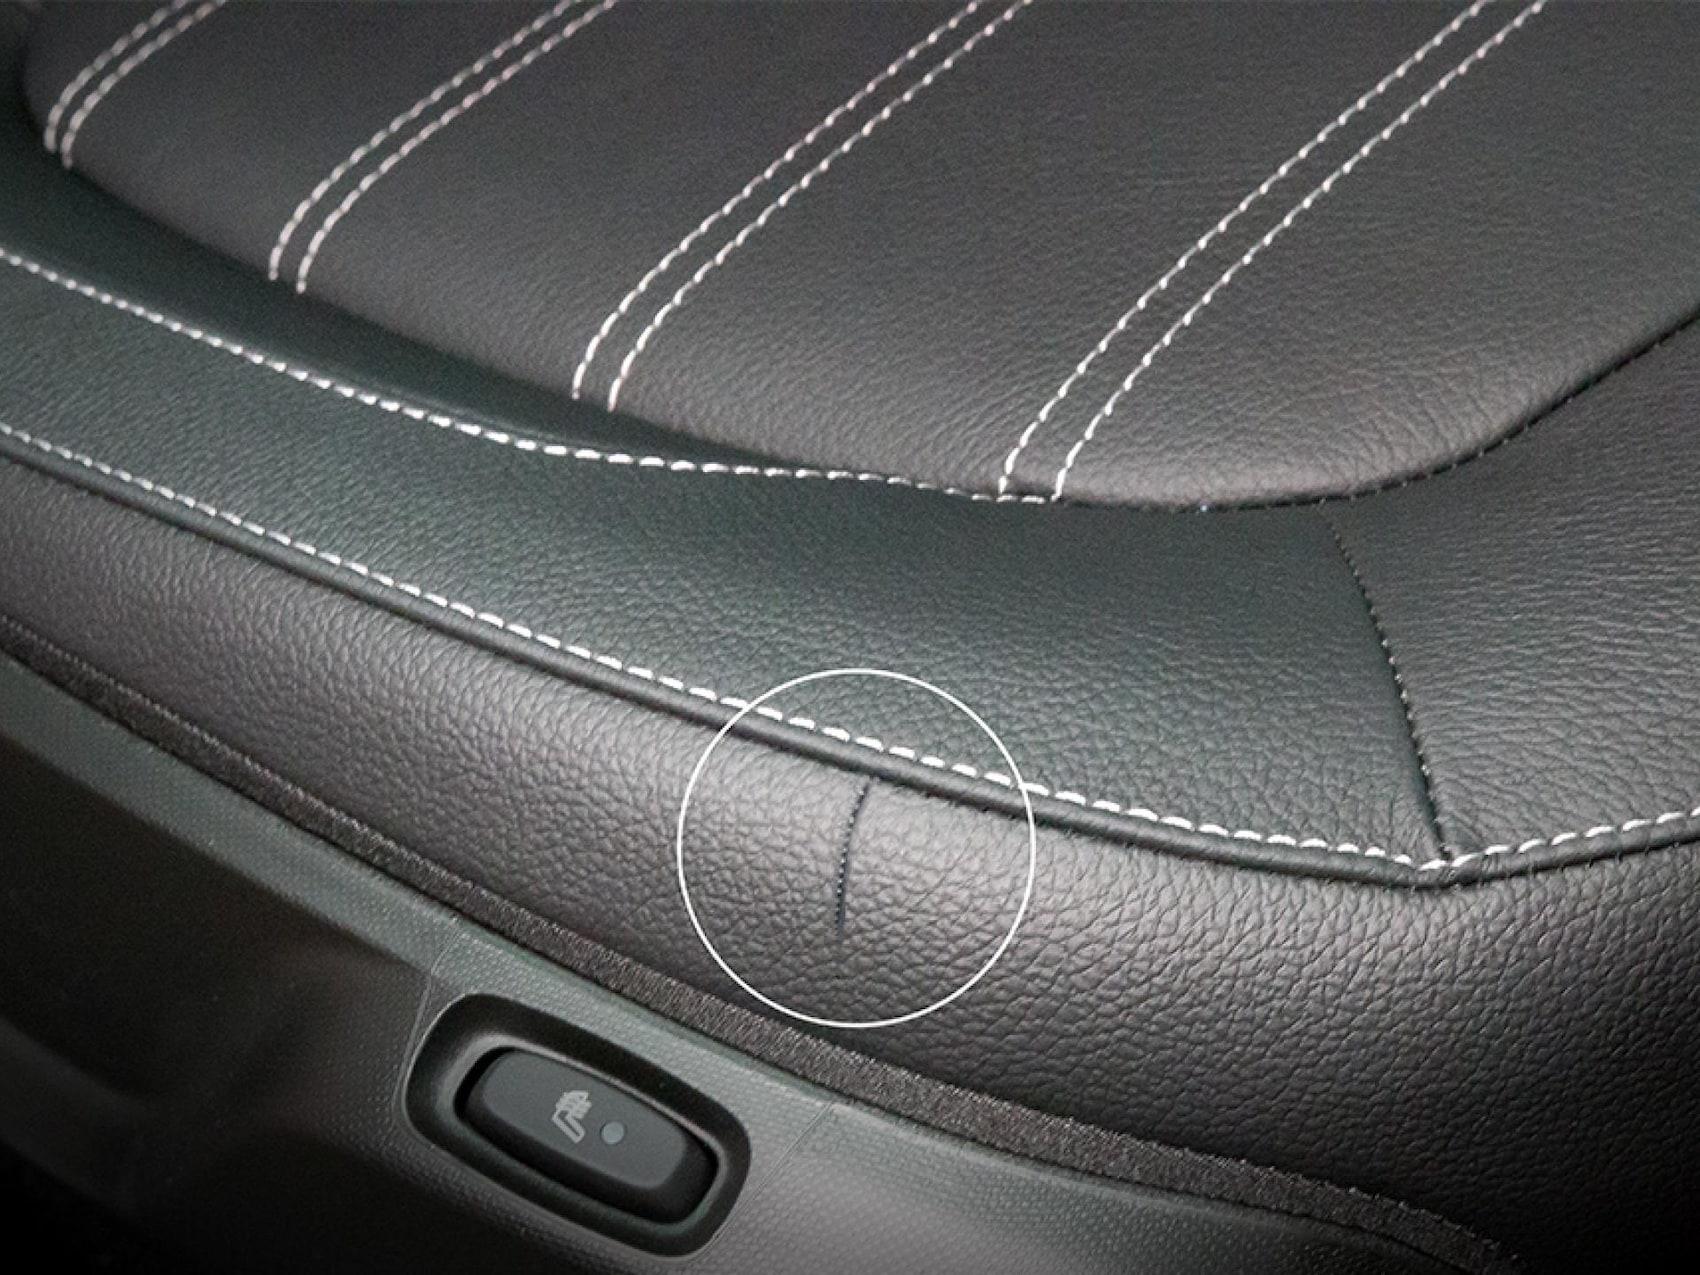 smart - Vehicle Return Standards